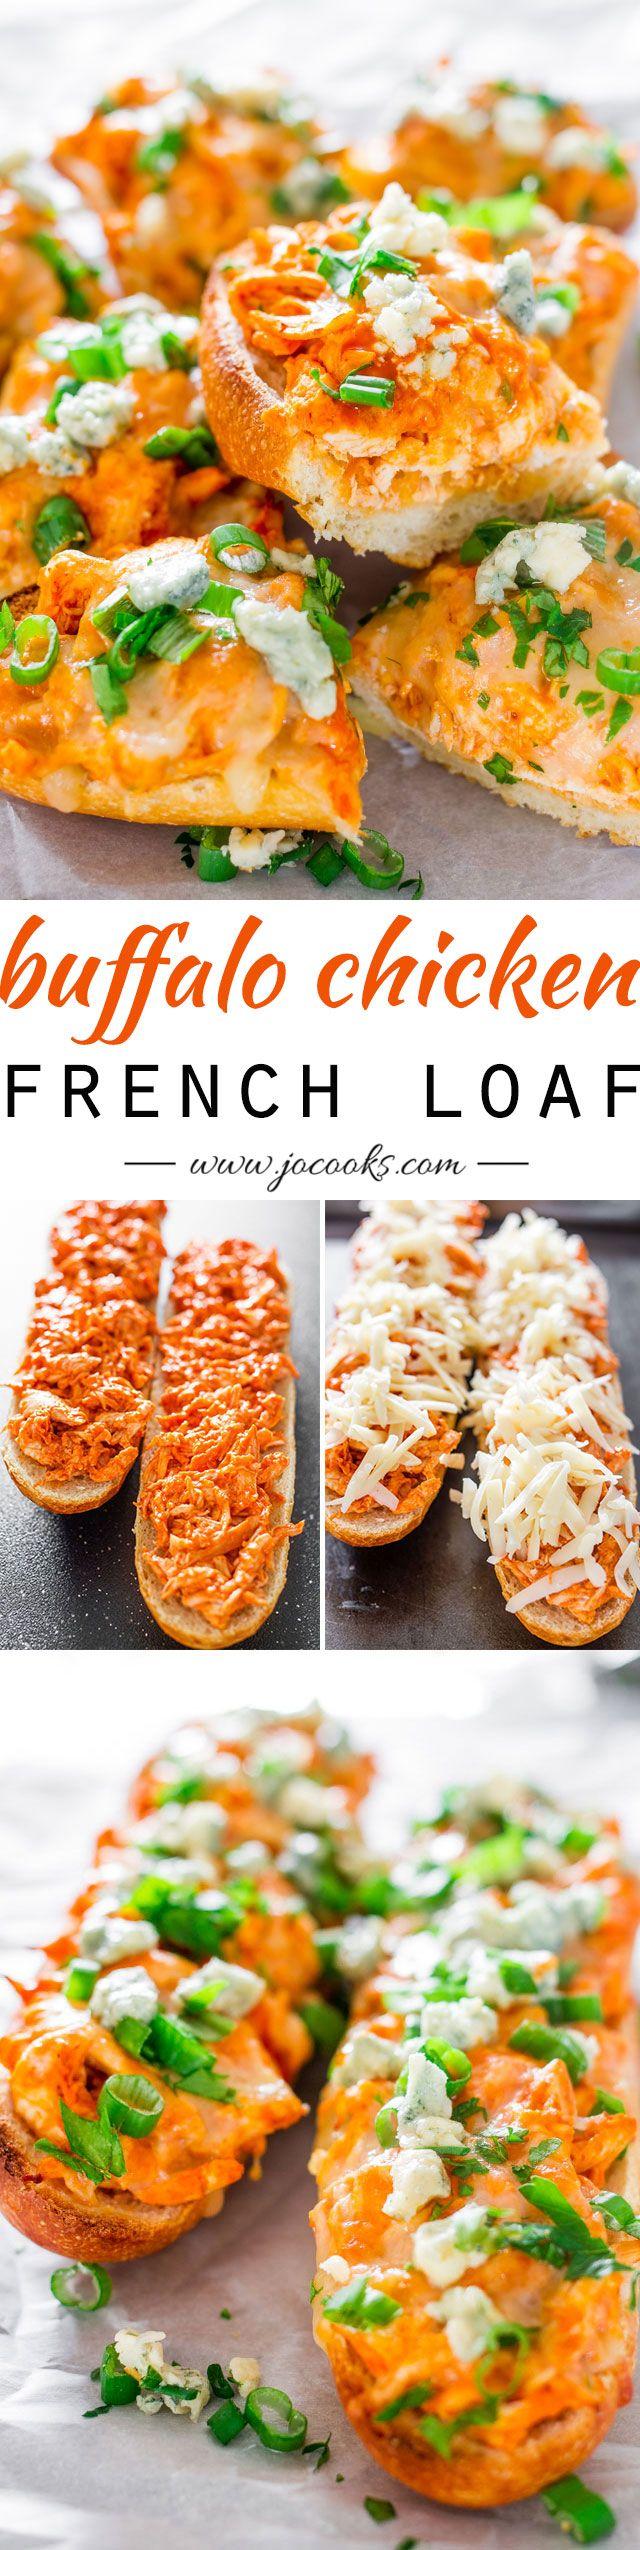 Buffalo Chicken French Loaf #appetizer #wings